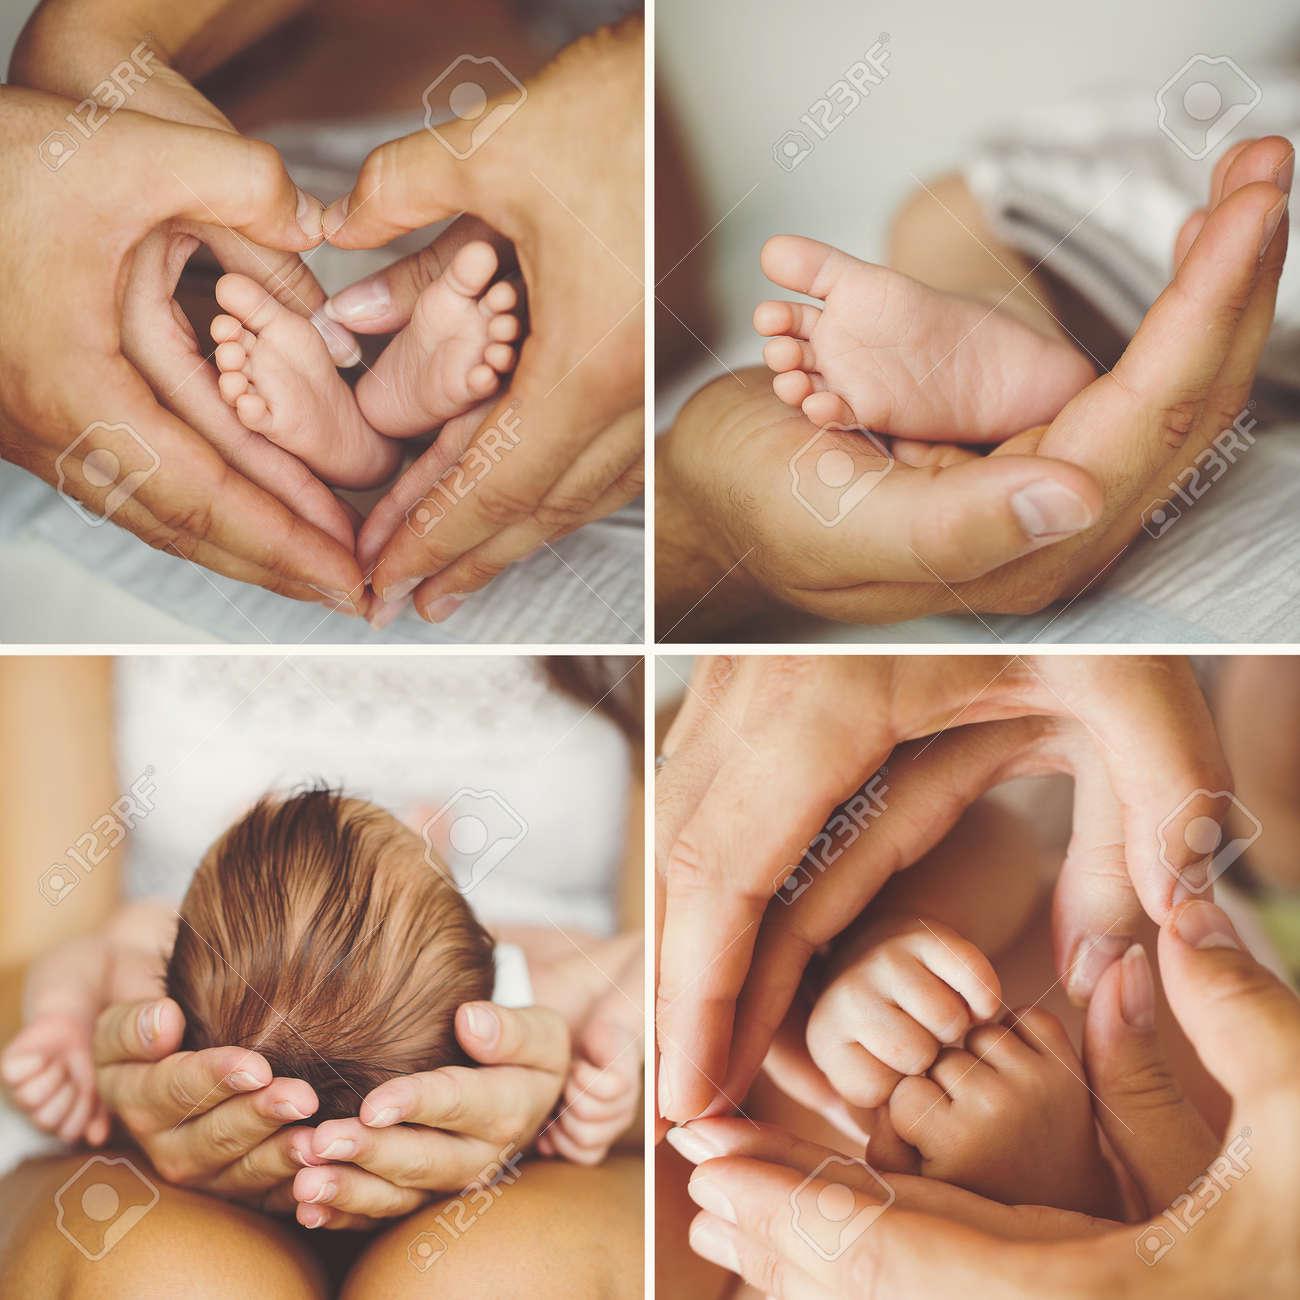 Сын делает массаж матери блондинке 27 фотография